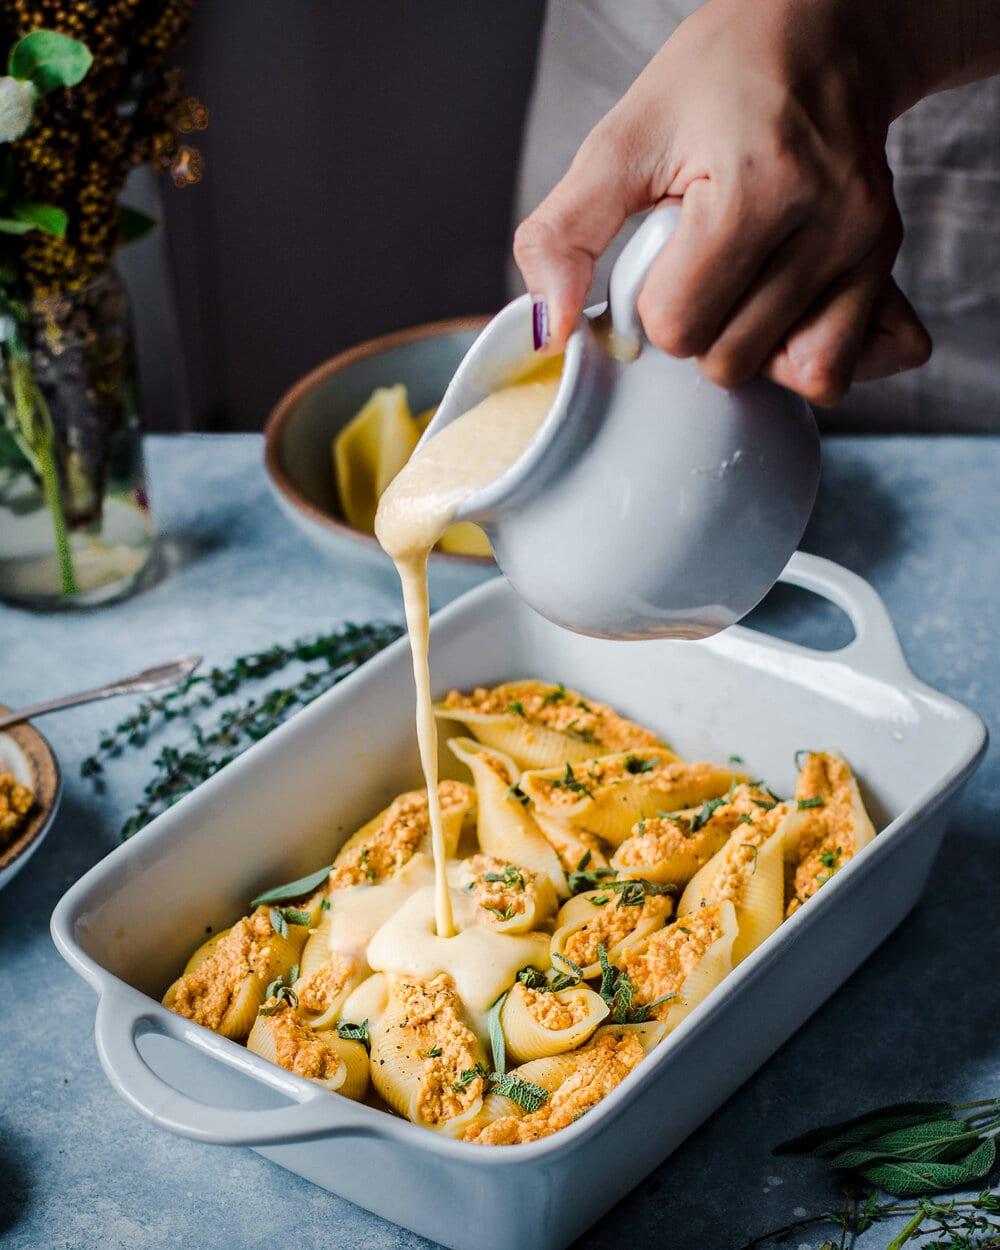 30 Vegan Thanksgiving Recipes and Ideas